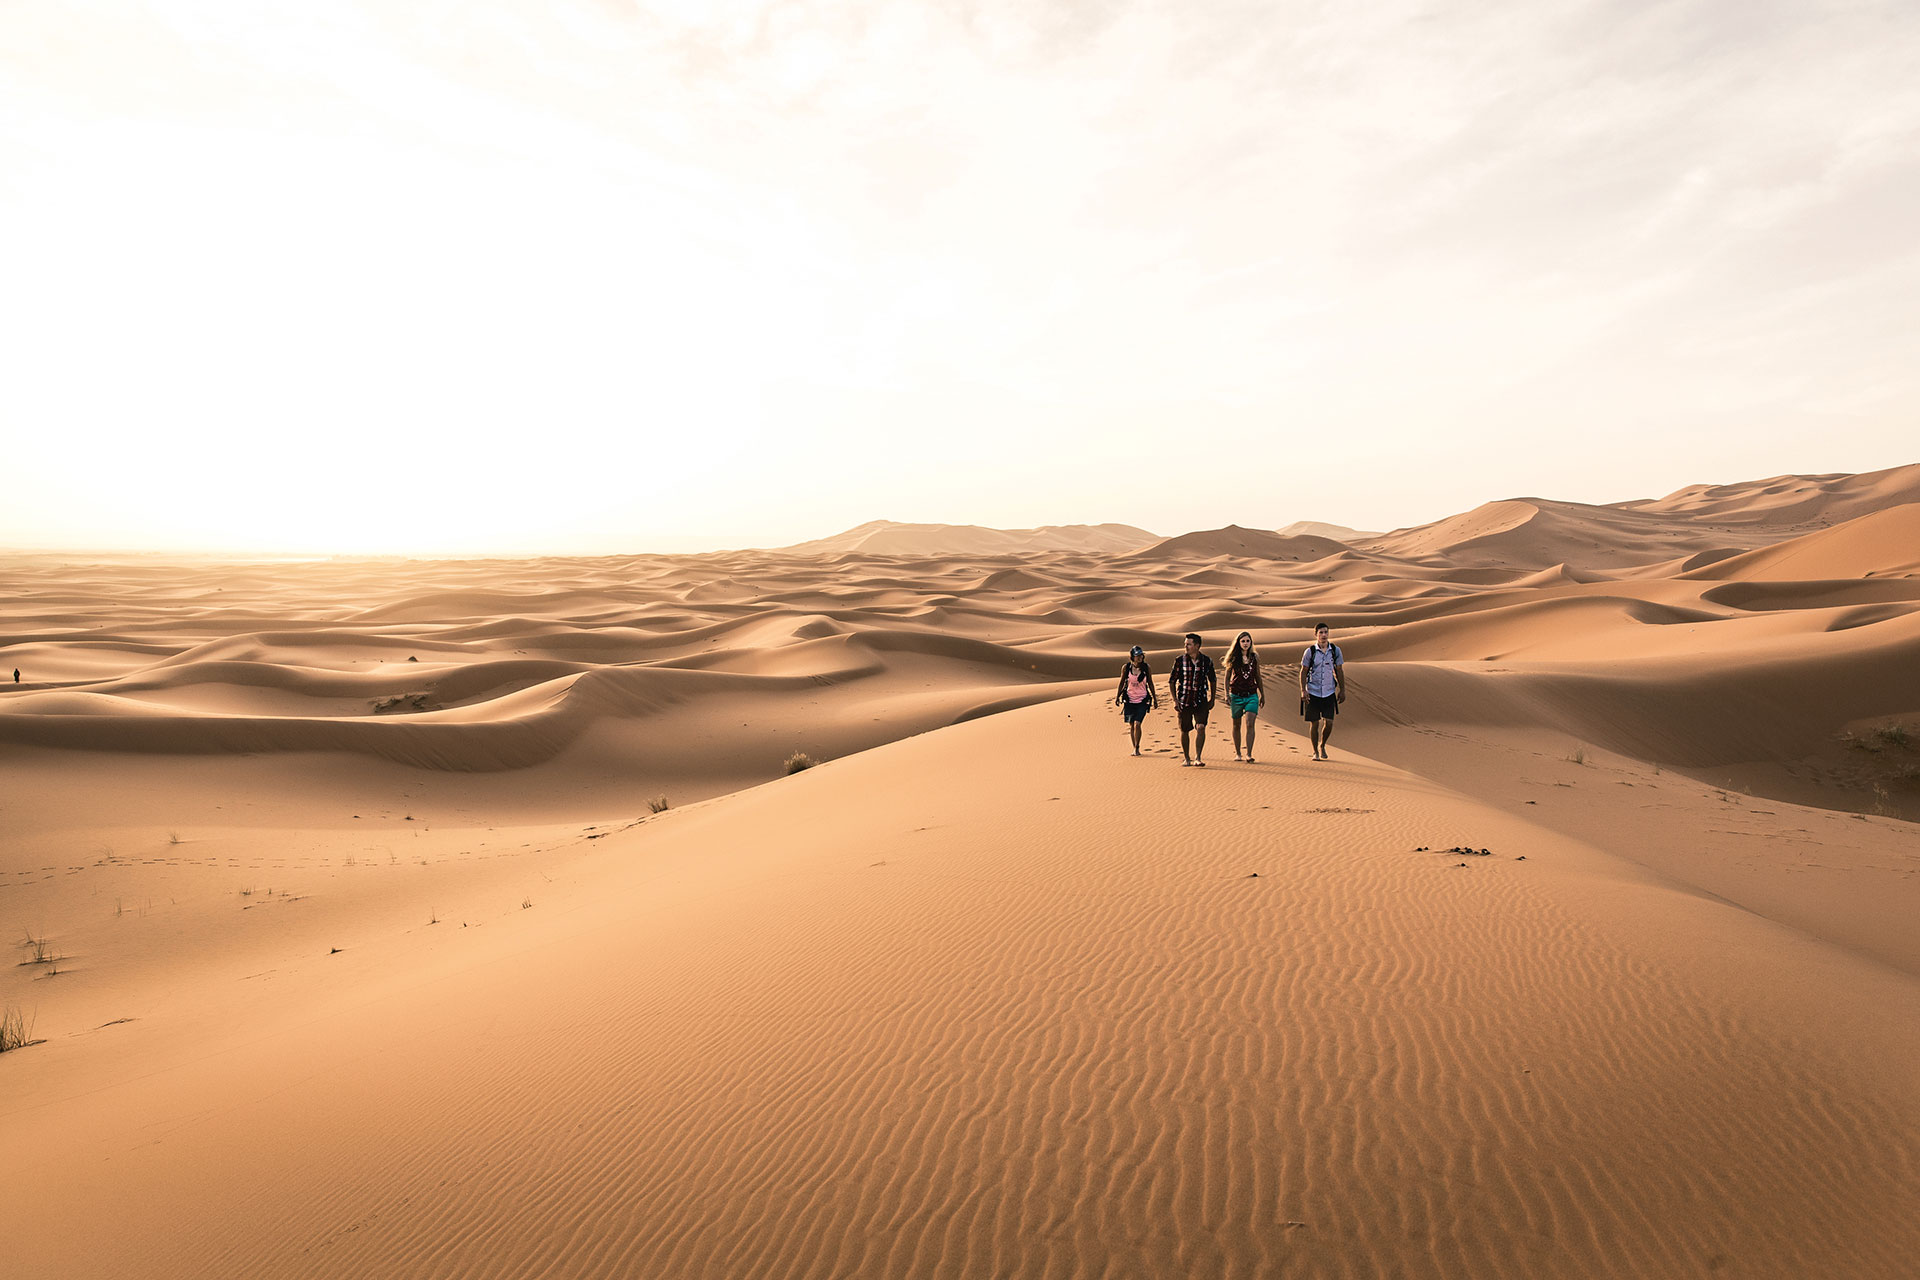 Reise Fotograf Travel Marokko Wüste Sand Outdoor Michael Müller London England